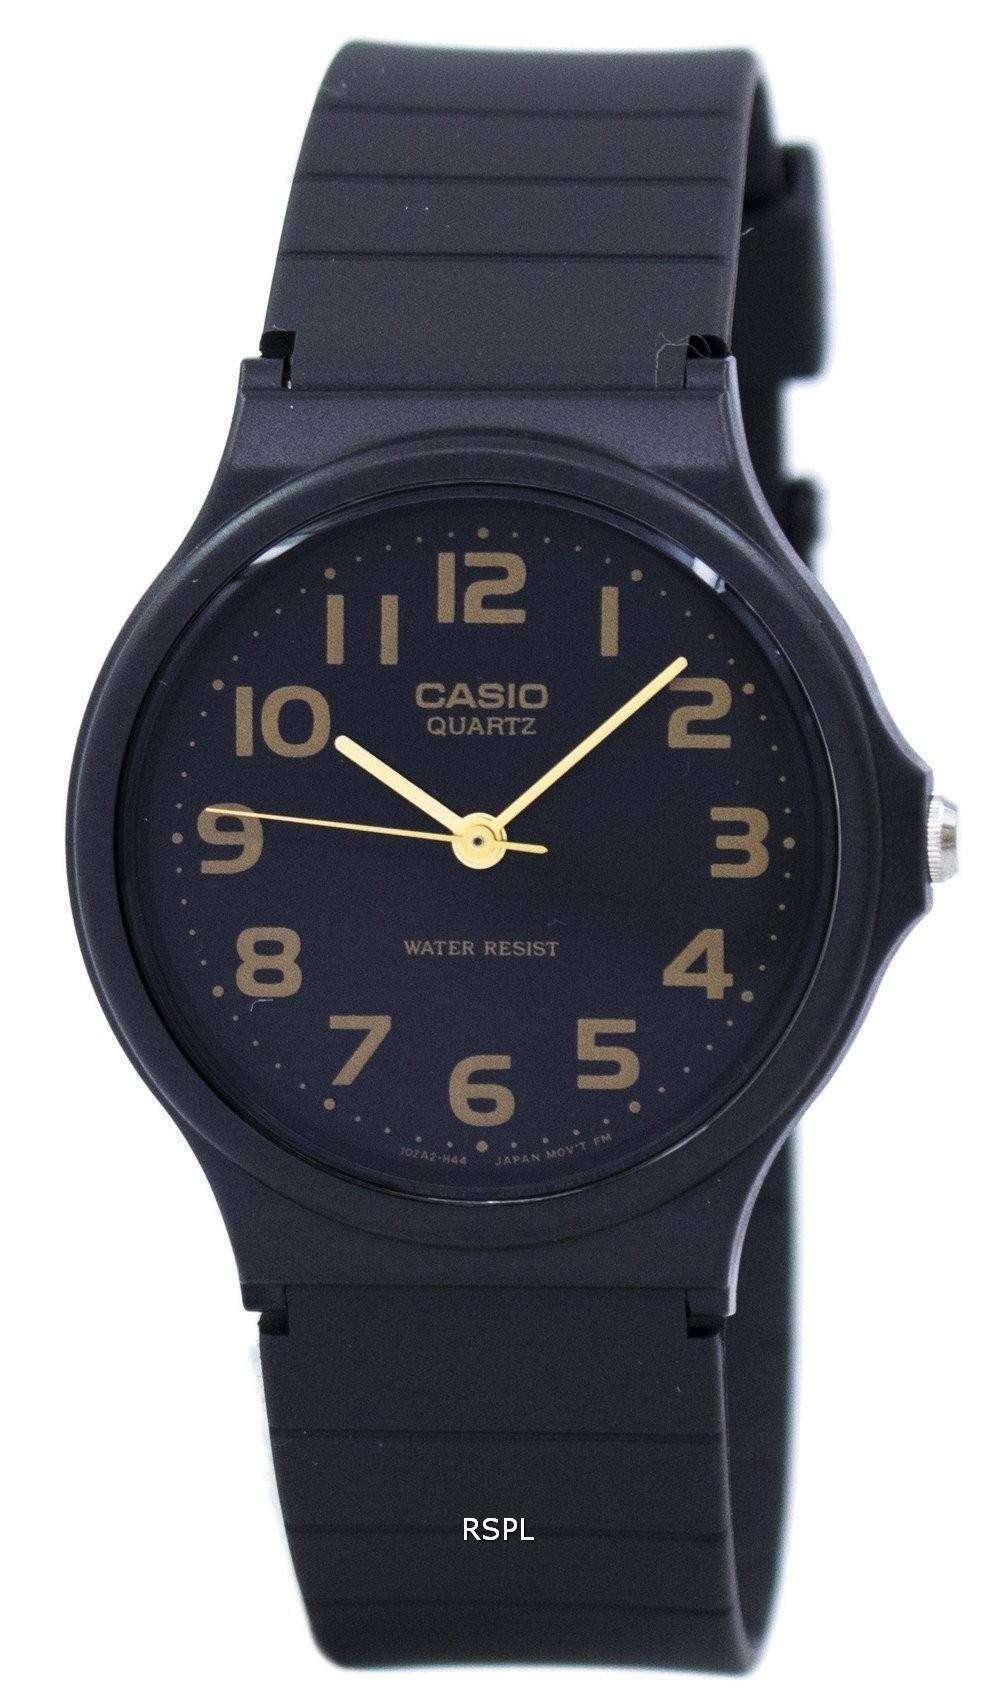 ef9acb57d1f8 Reloj Casio clásico cuarzo correa negra MQ-24-1B2LDF MQ-24-1B2L de ...